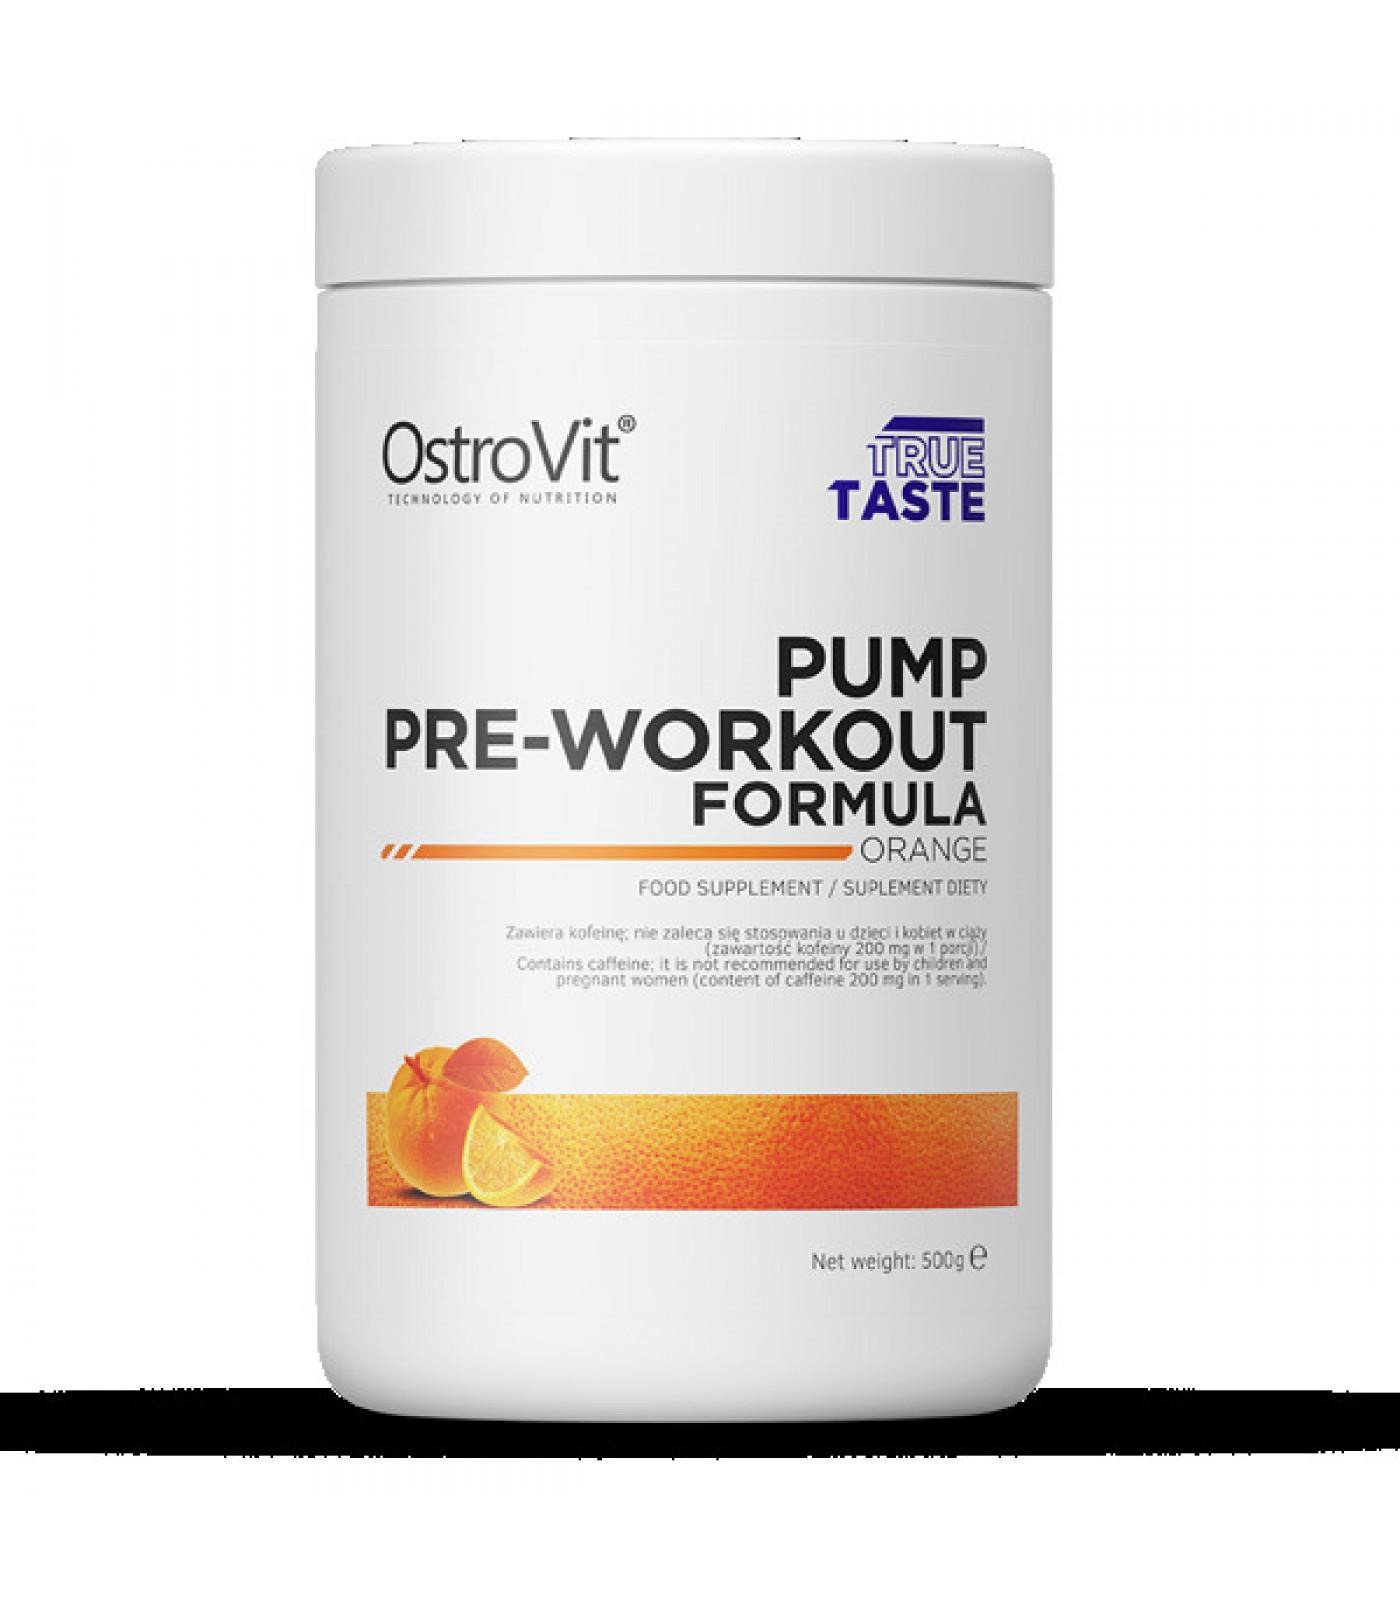 OstroVit - PUMP Pre-Workout Formula / 500g.